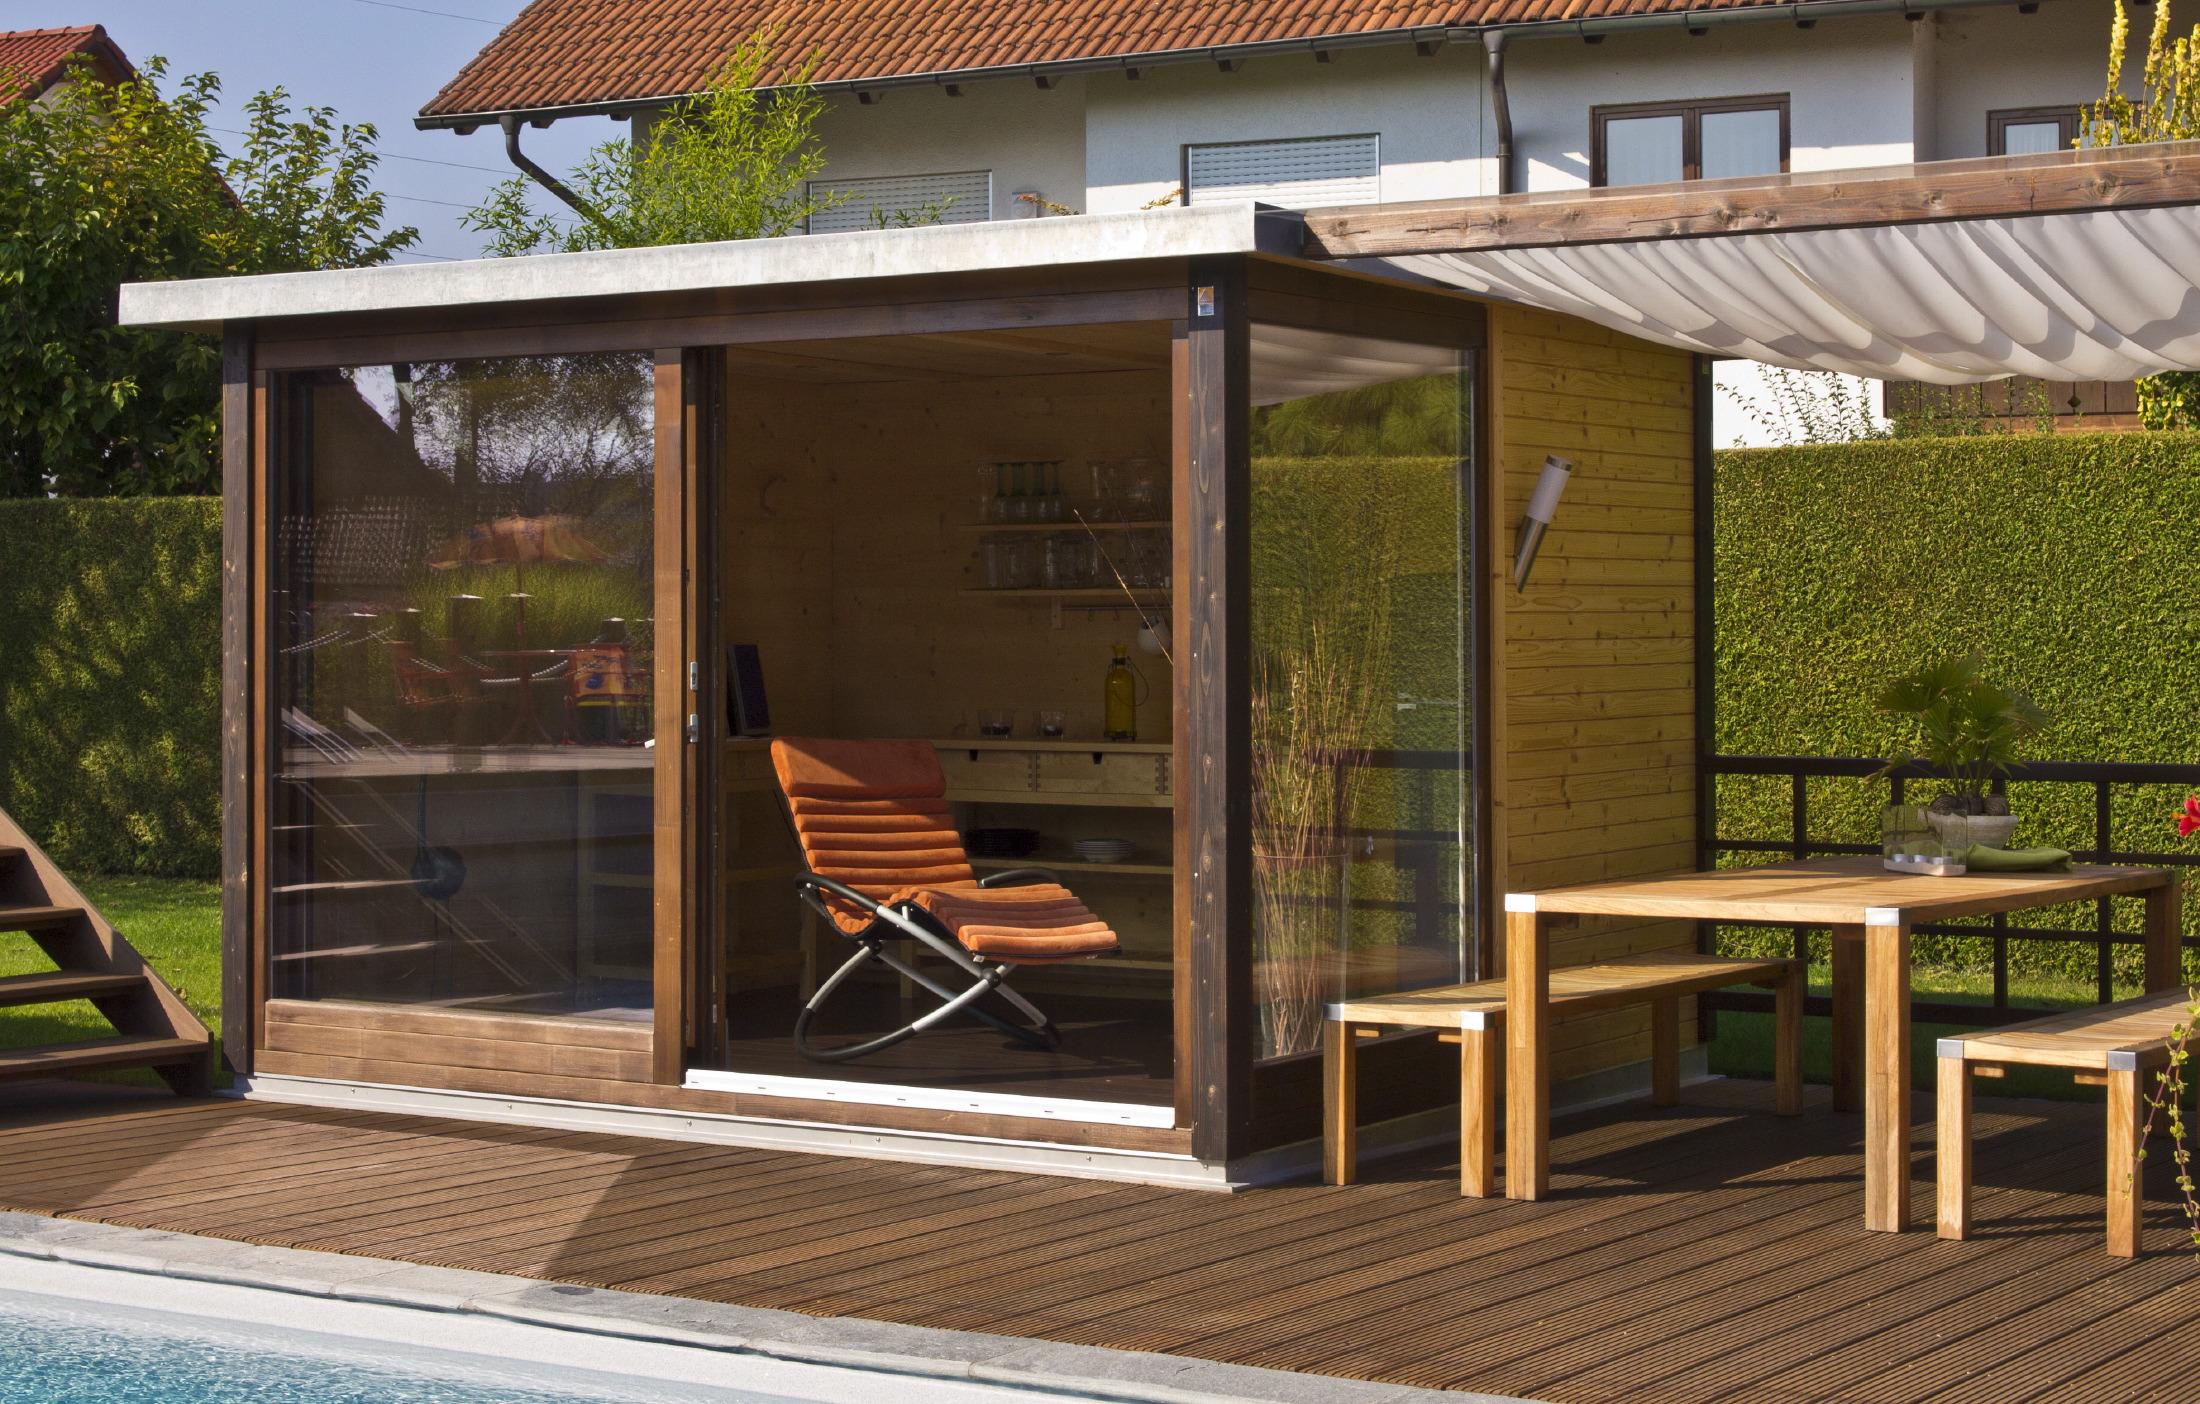 gartenhaus cube arkansasgreenguide. Black Bedroom Furniture Sets. Home Design Ideas